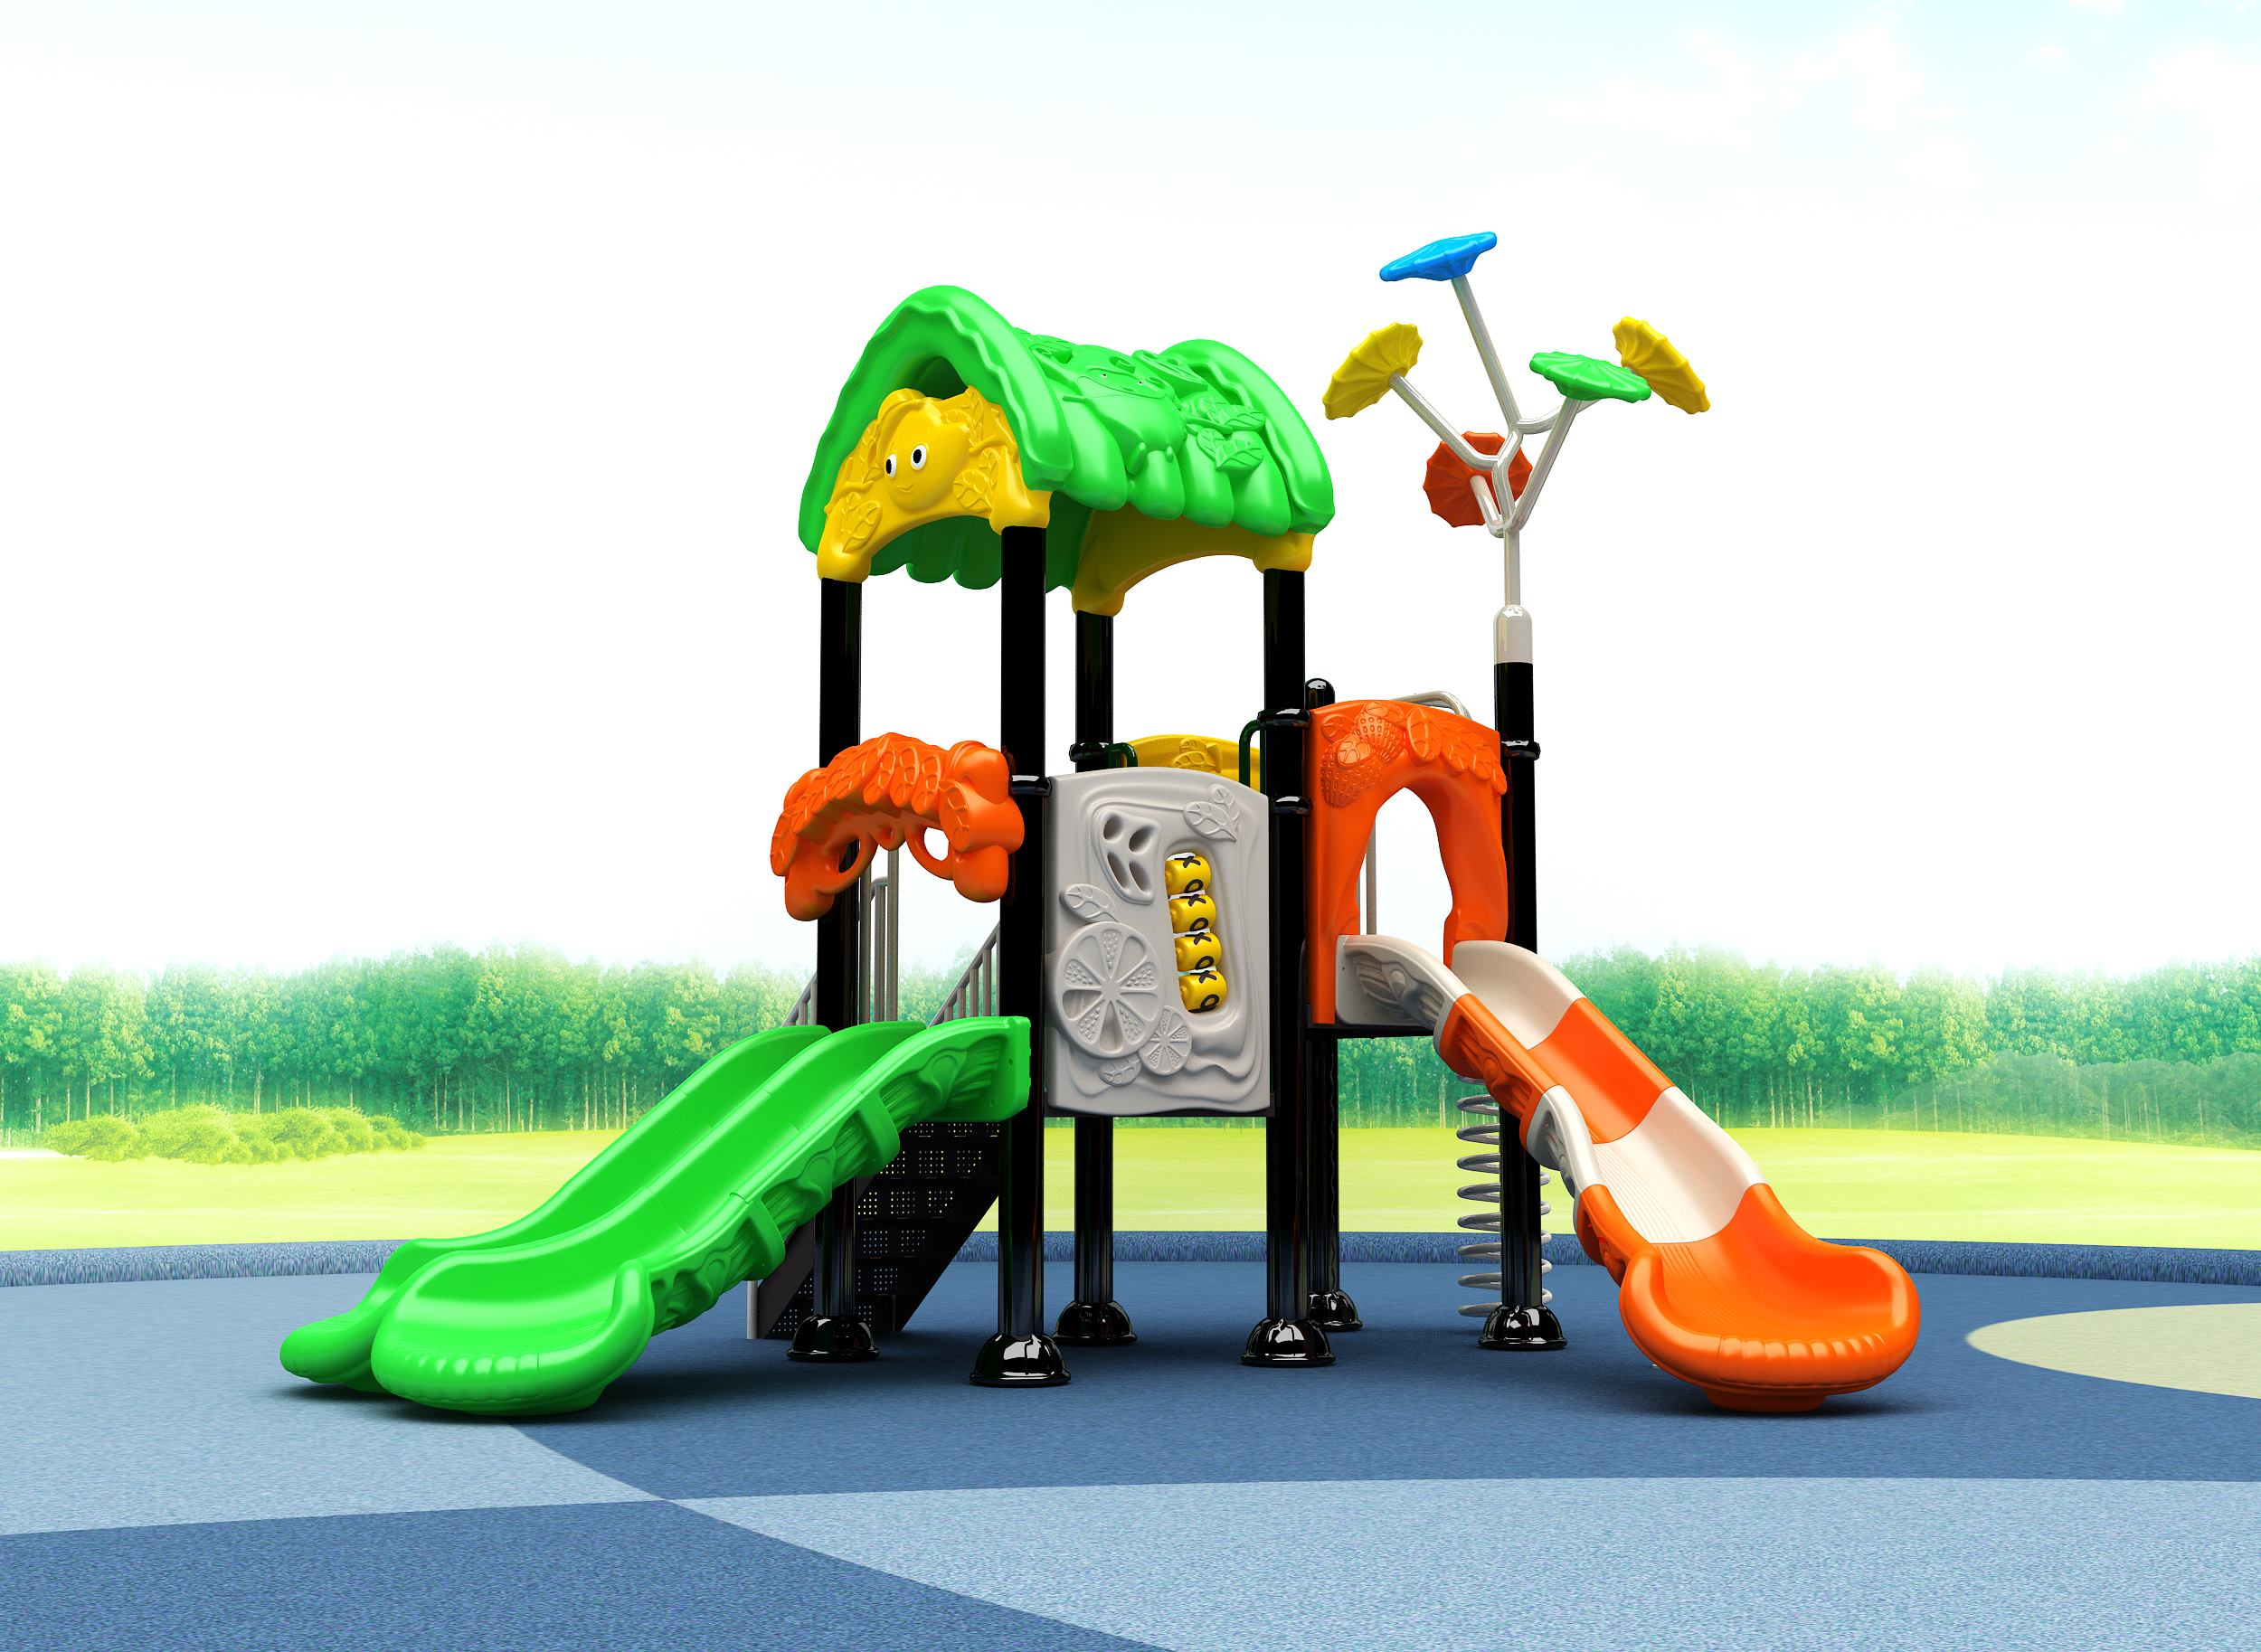 soza playground parques infantiles juegos para nios parques plsticos parques plasticos parques infantiles bogota parques infantiles